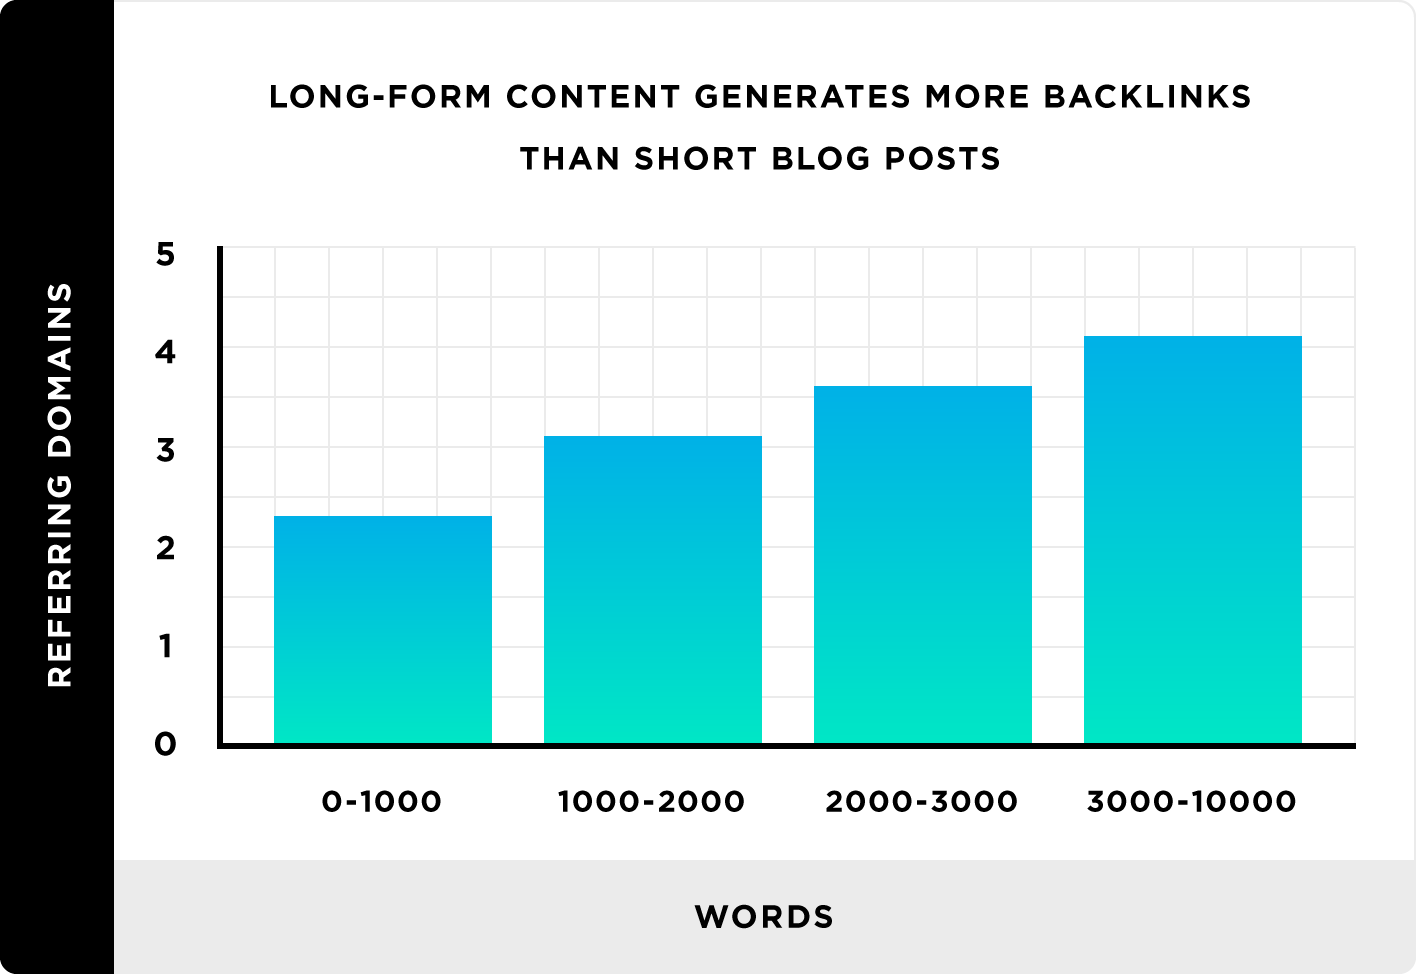 Long form content generates more backlink than short blog posts